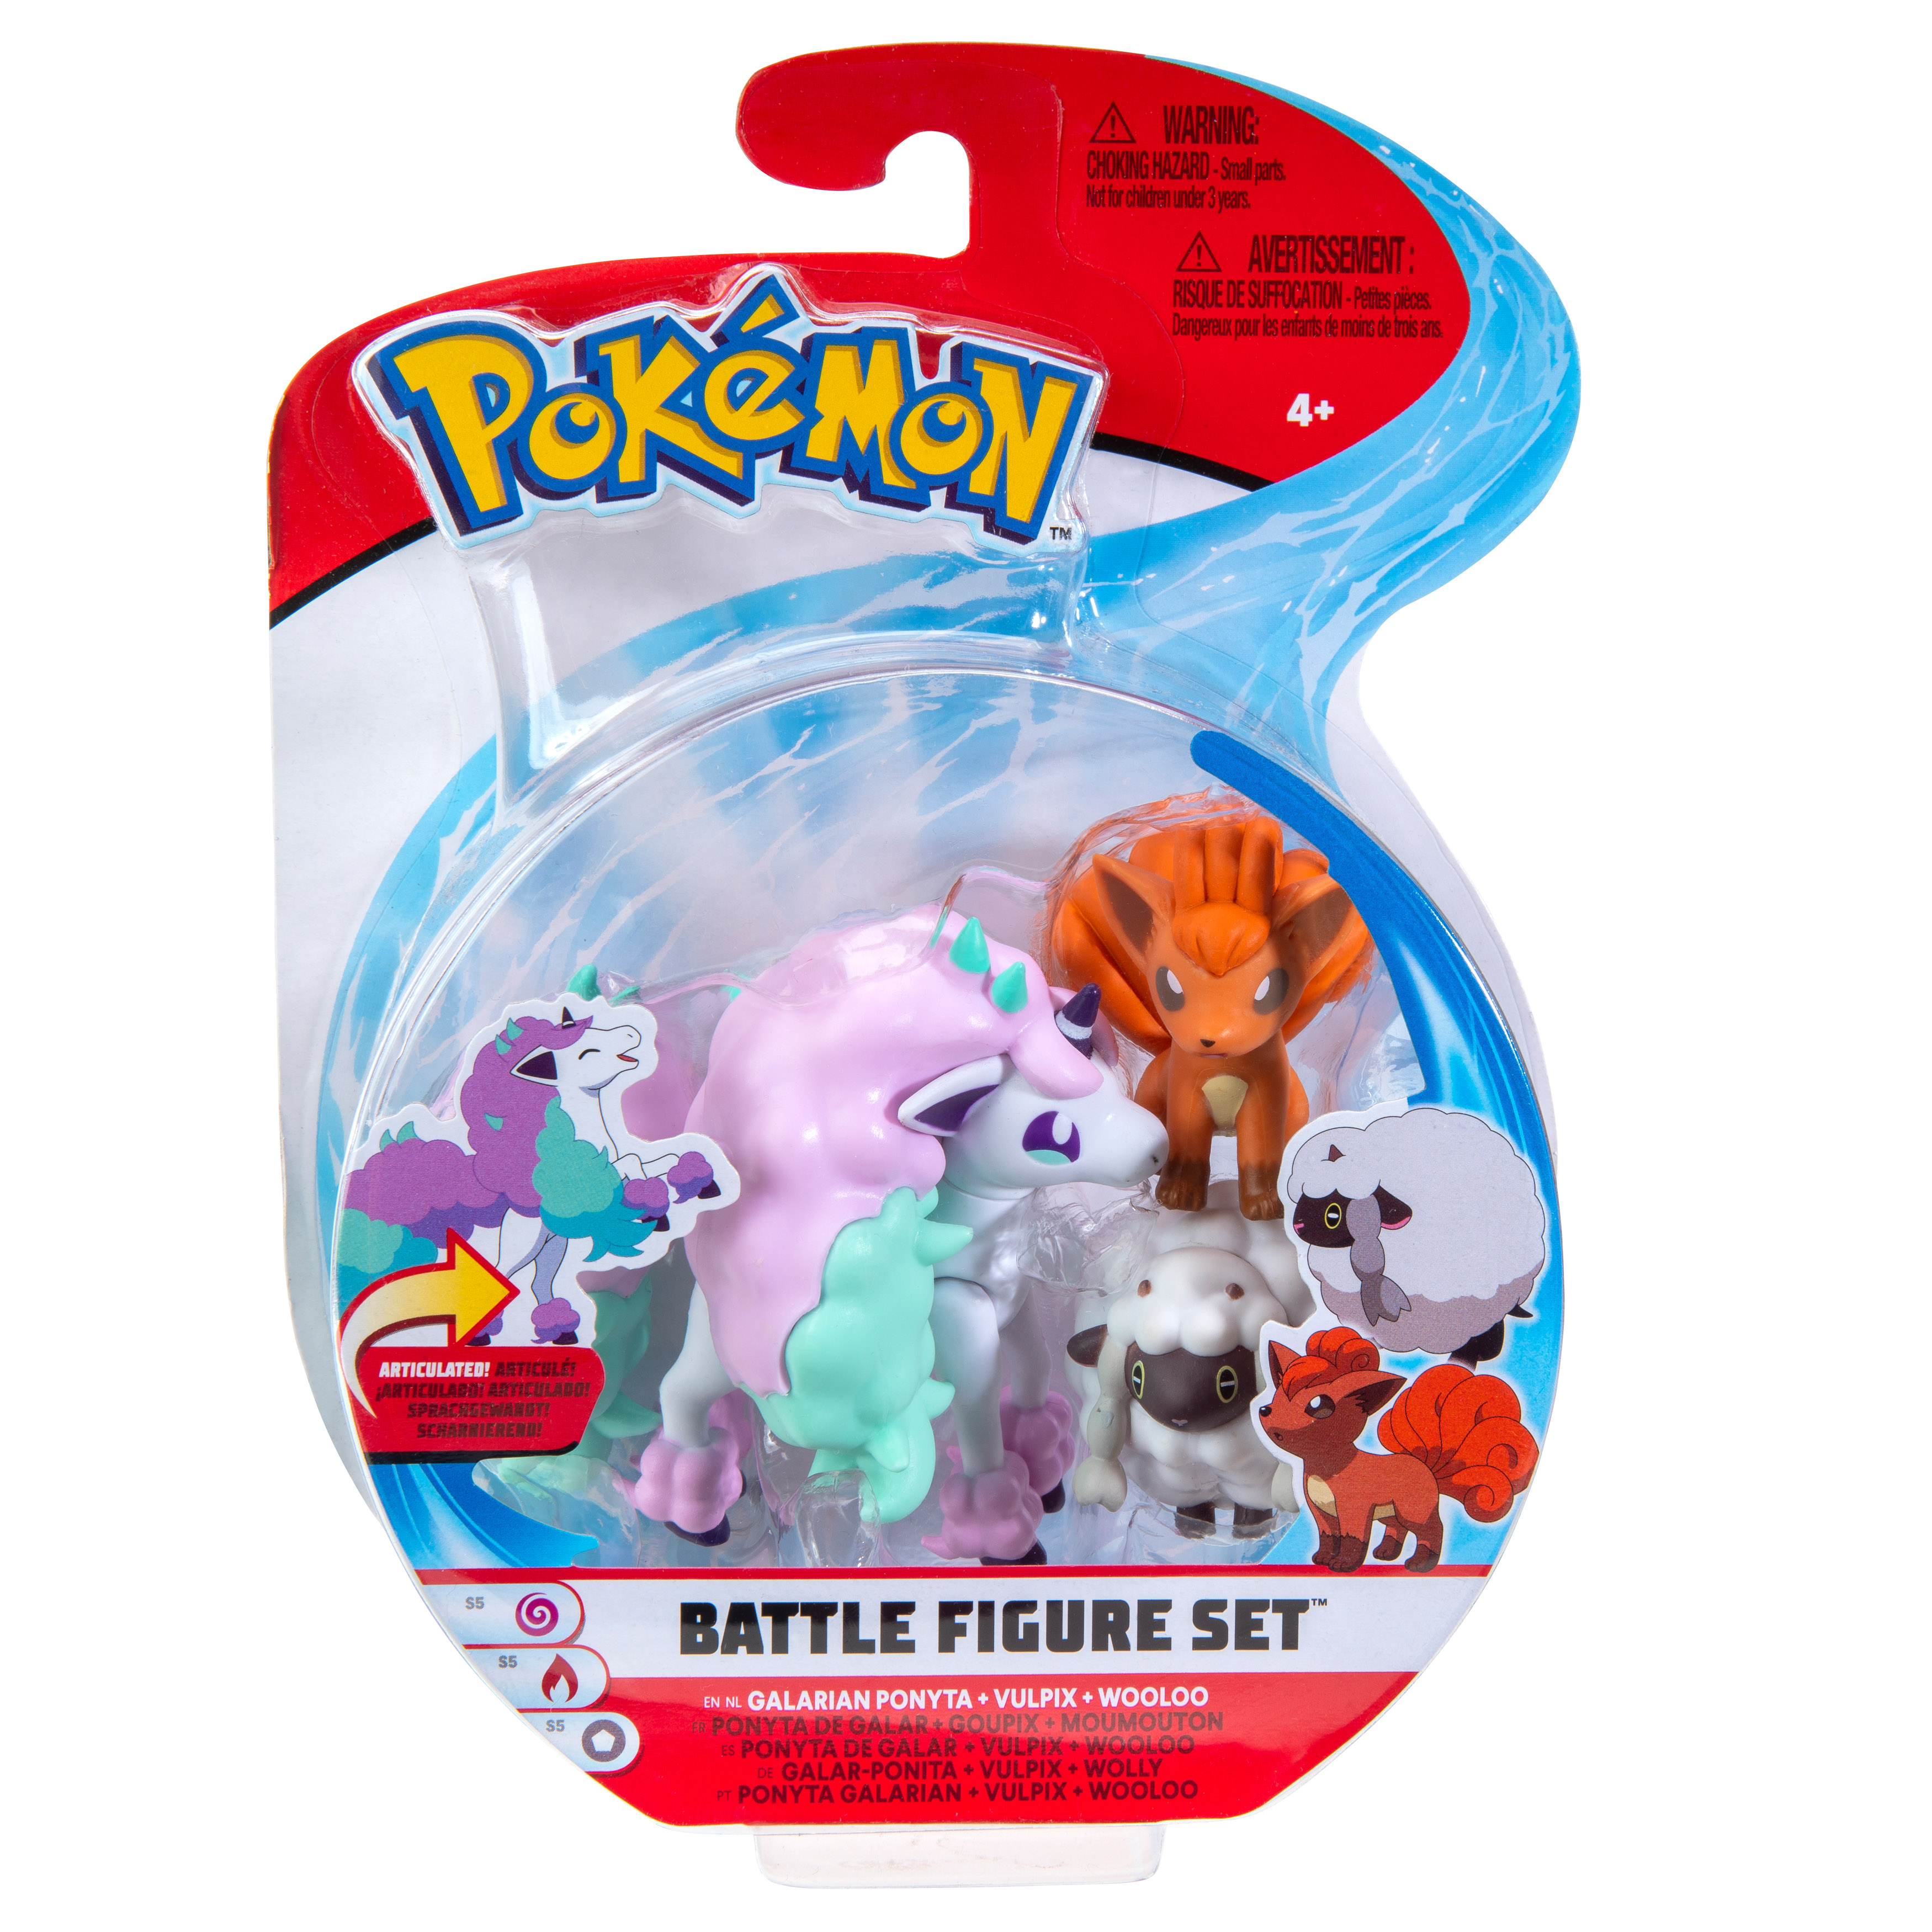 Pokémon - Battle Figur 3er Pack - Wolly, Vulpix & Galar Ponita